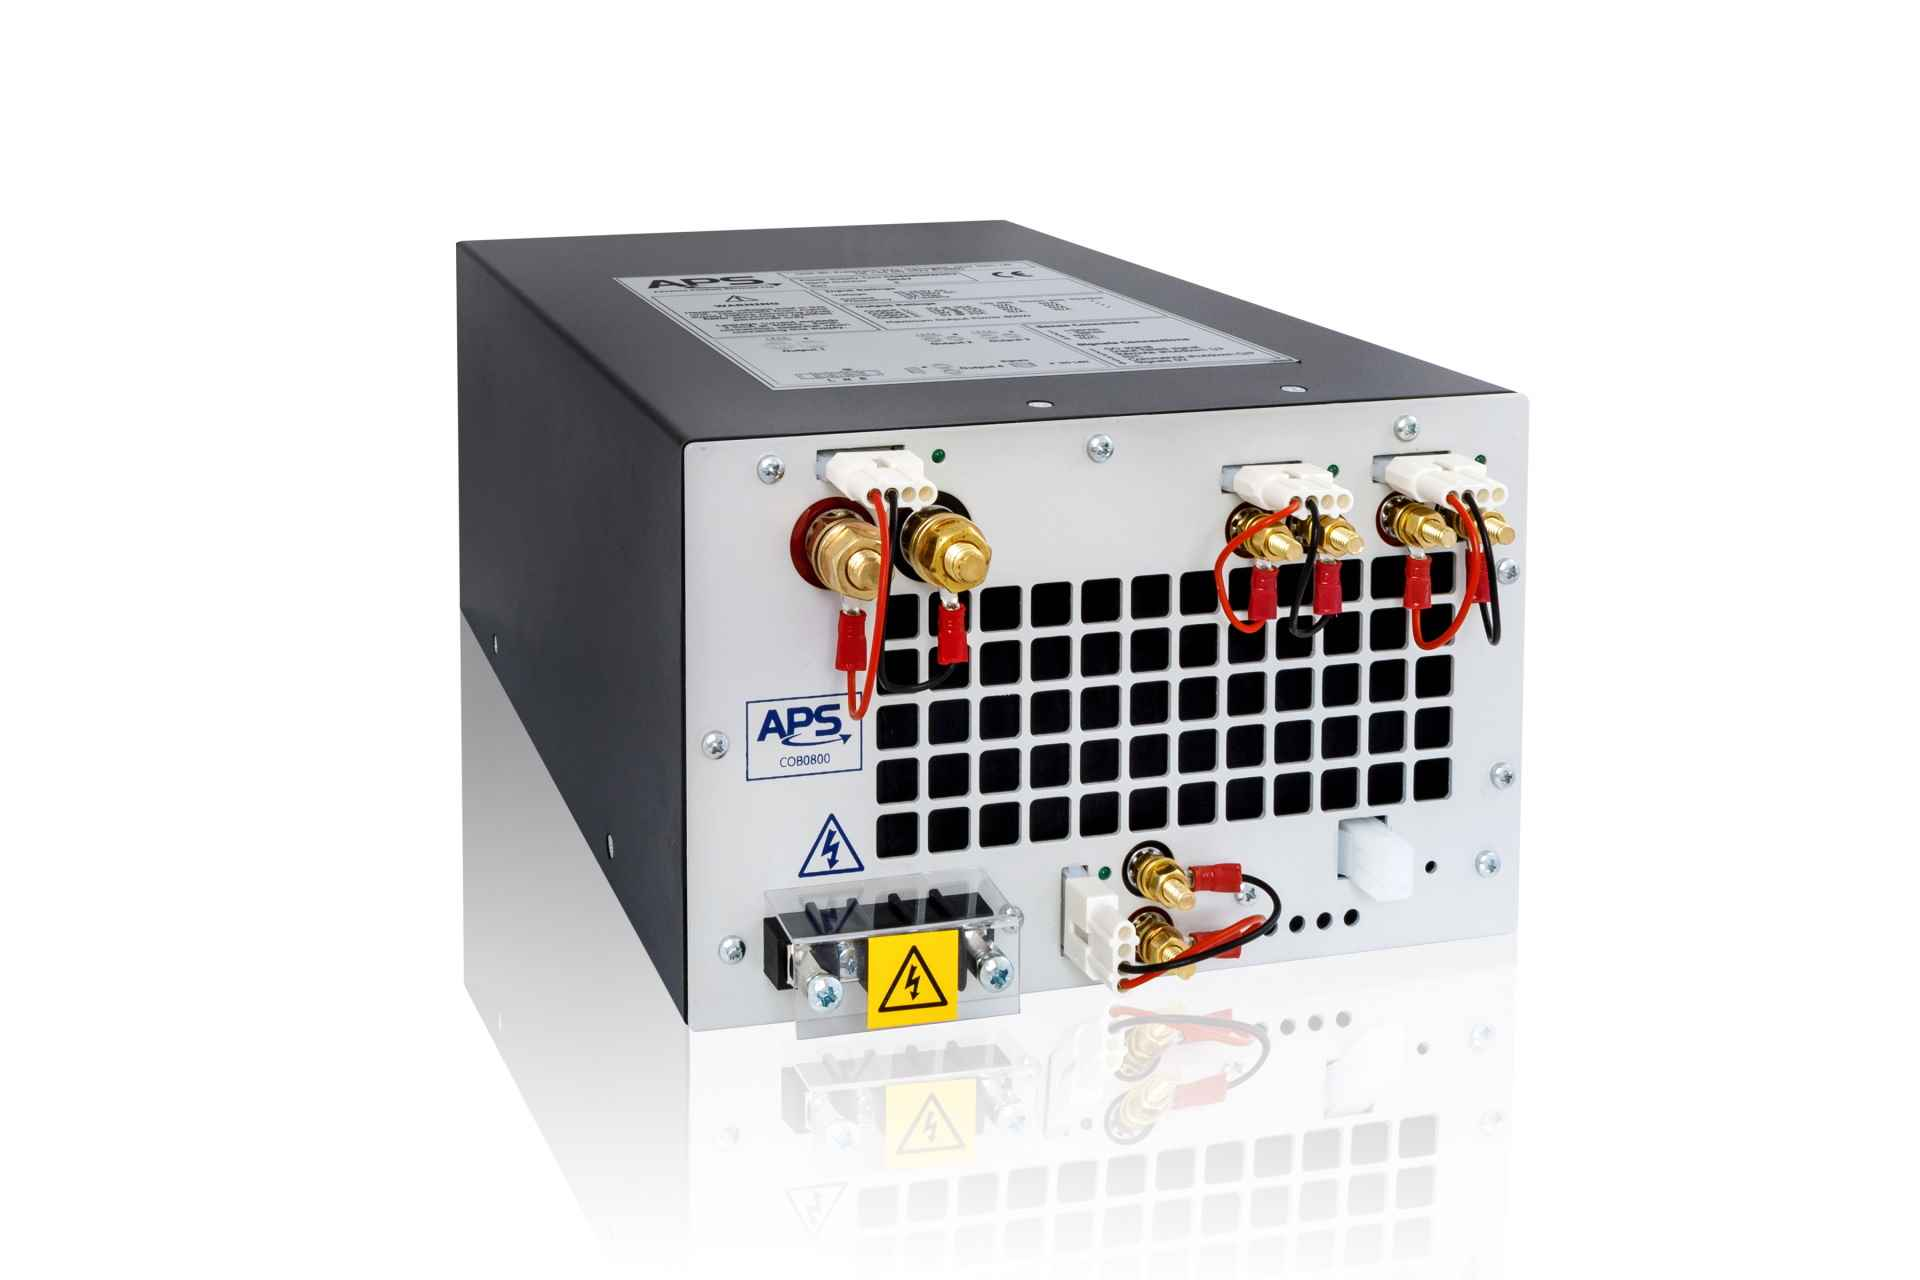 Hiflex-750 Hiflex-1000 replacement PSU